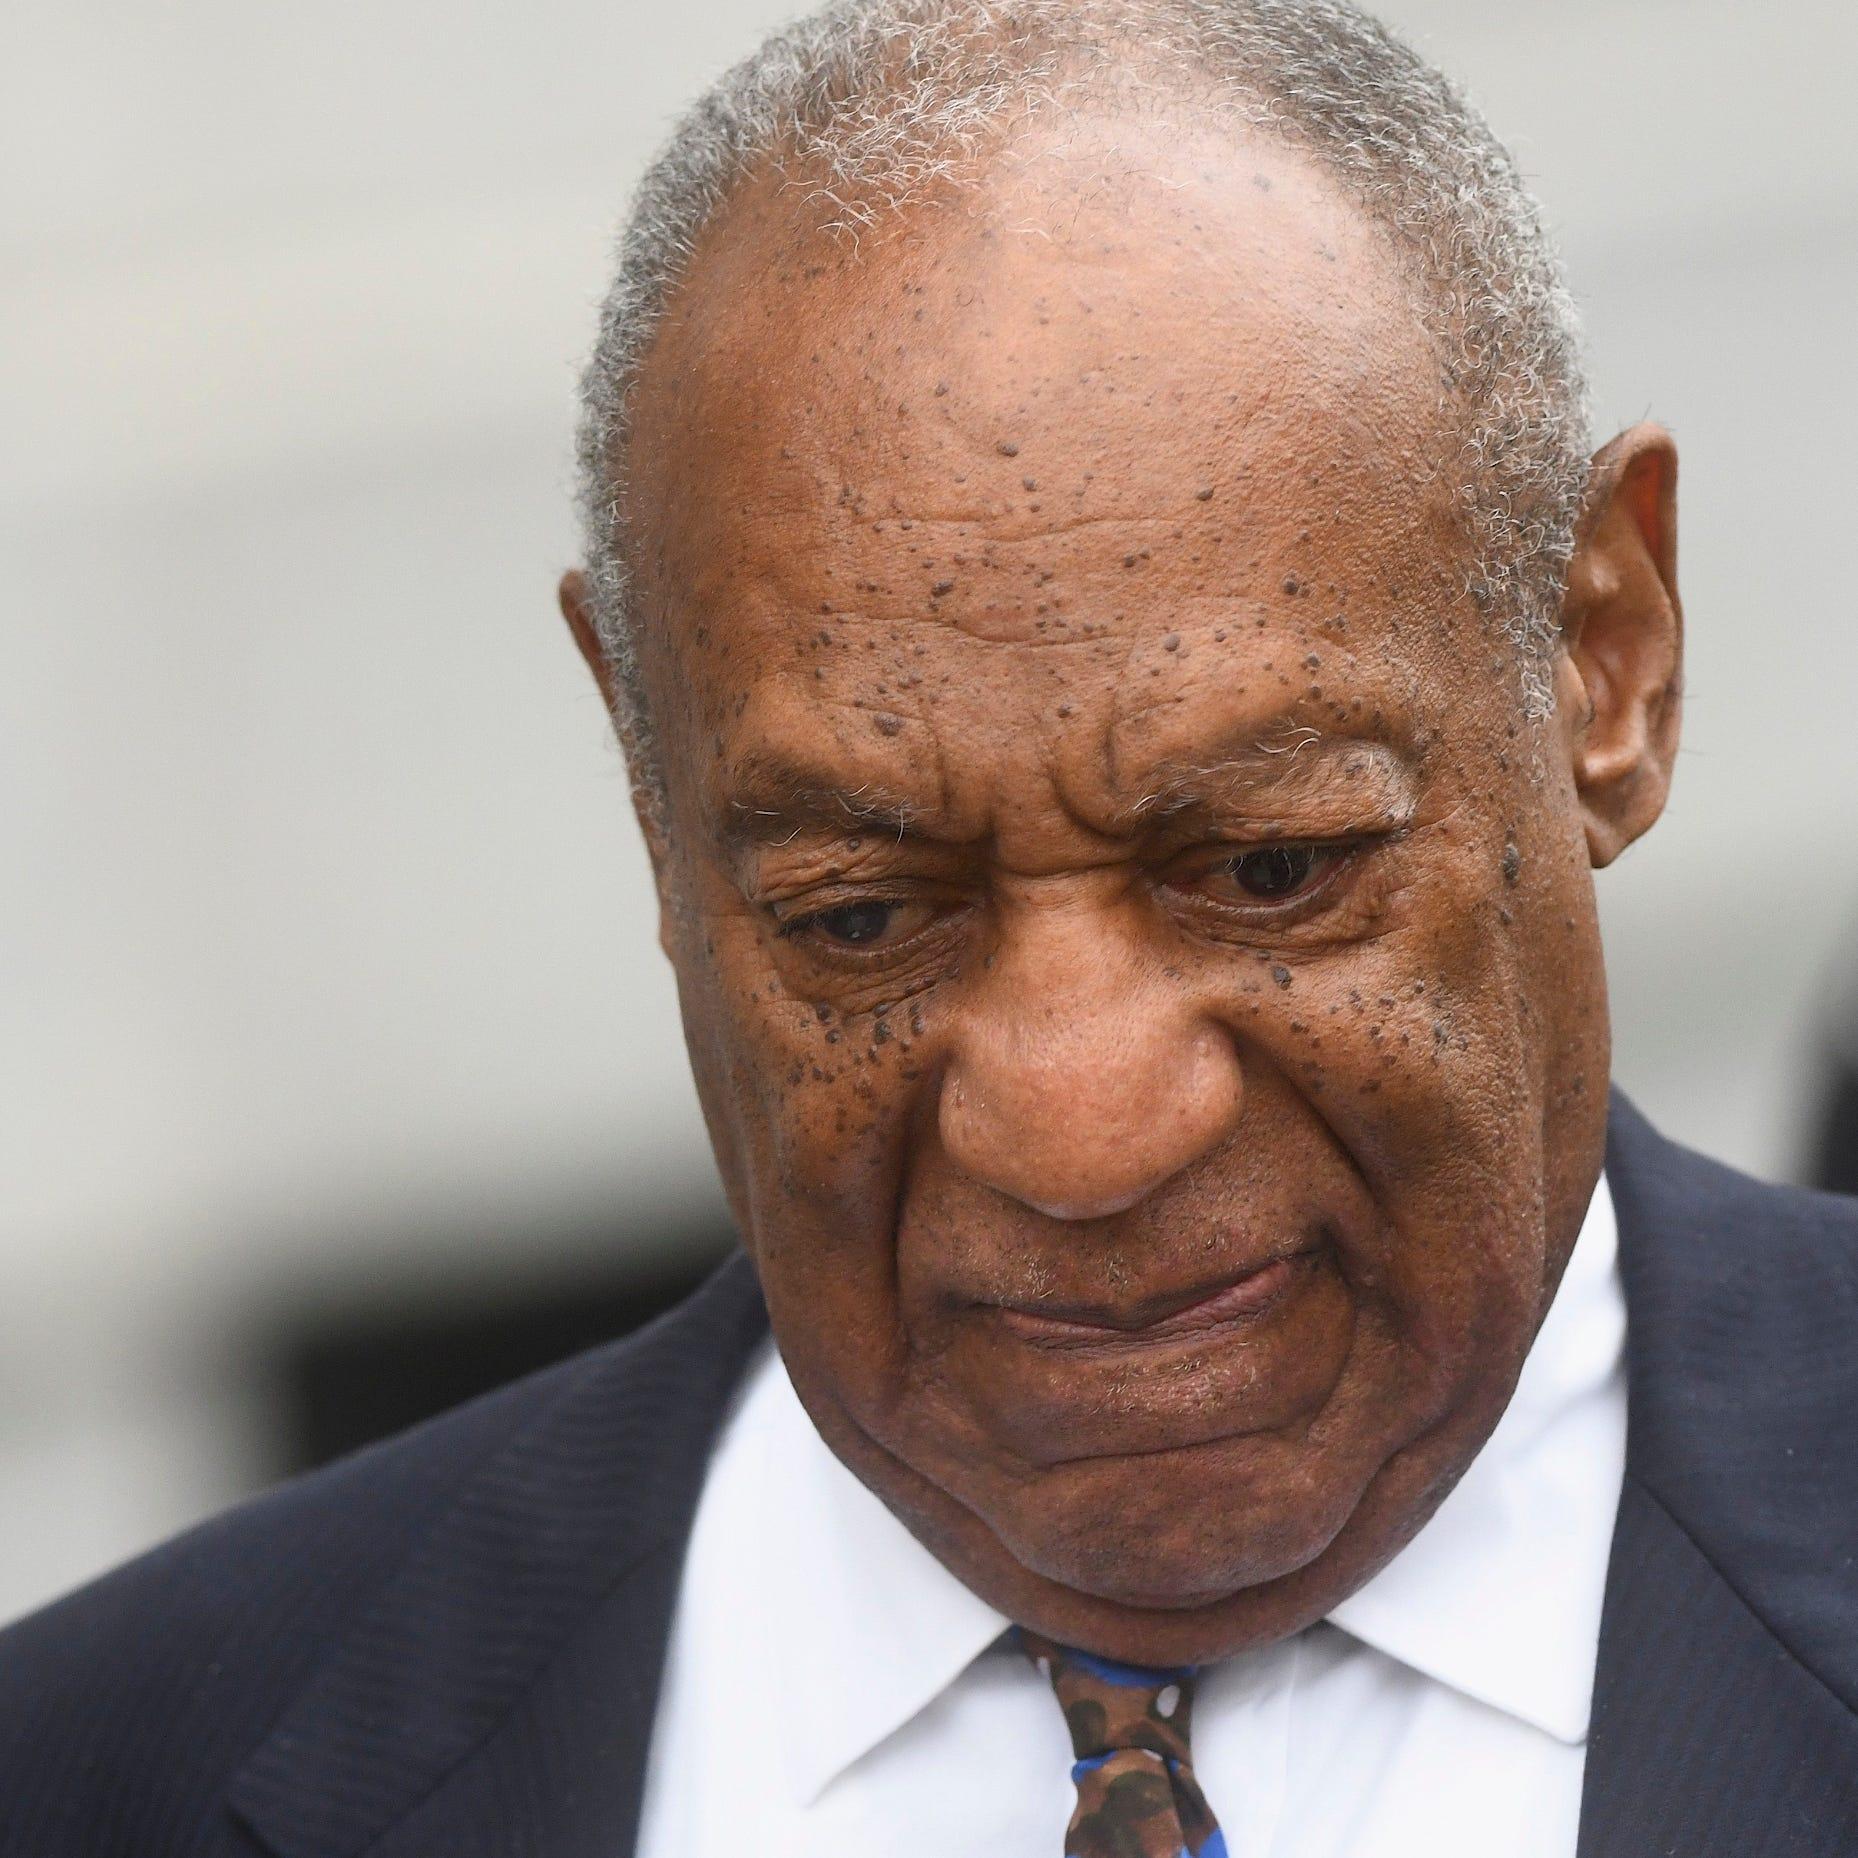 Twitter reacts to Bill Cosby sentencing amidst #MeToo, Brett Kavanaugh allegations